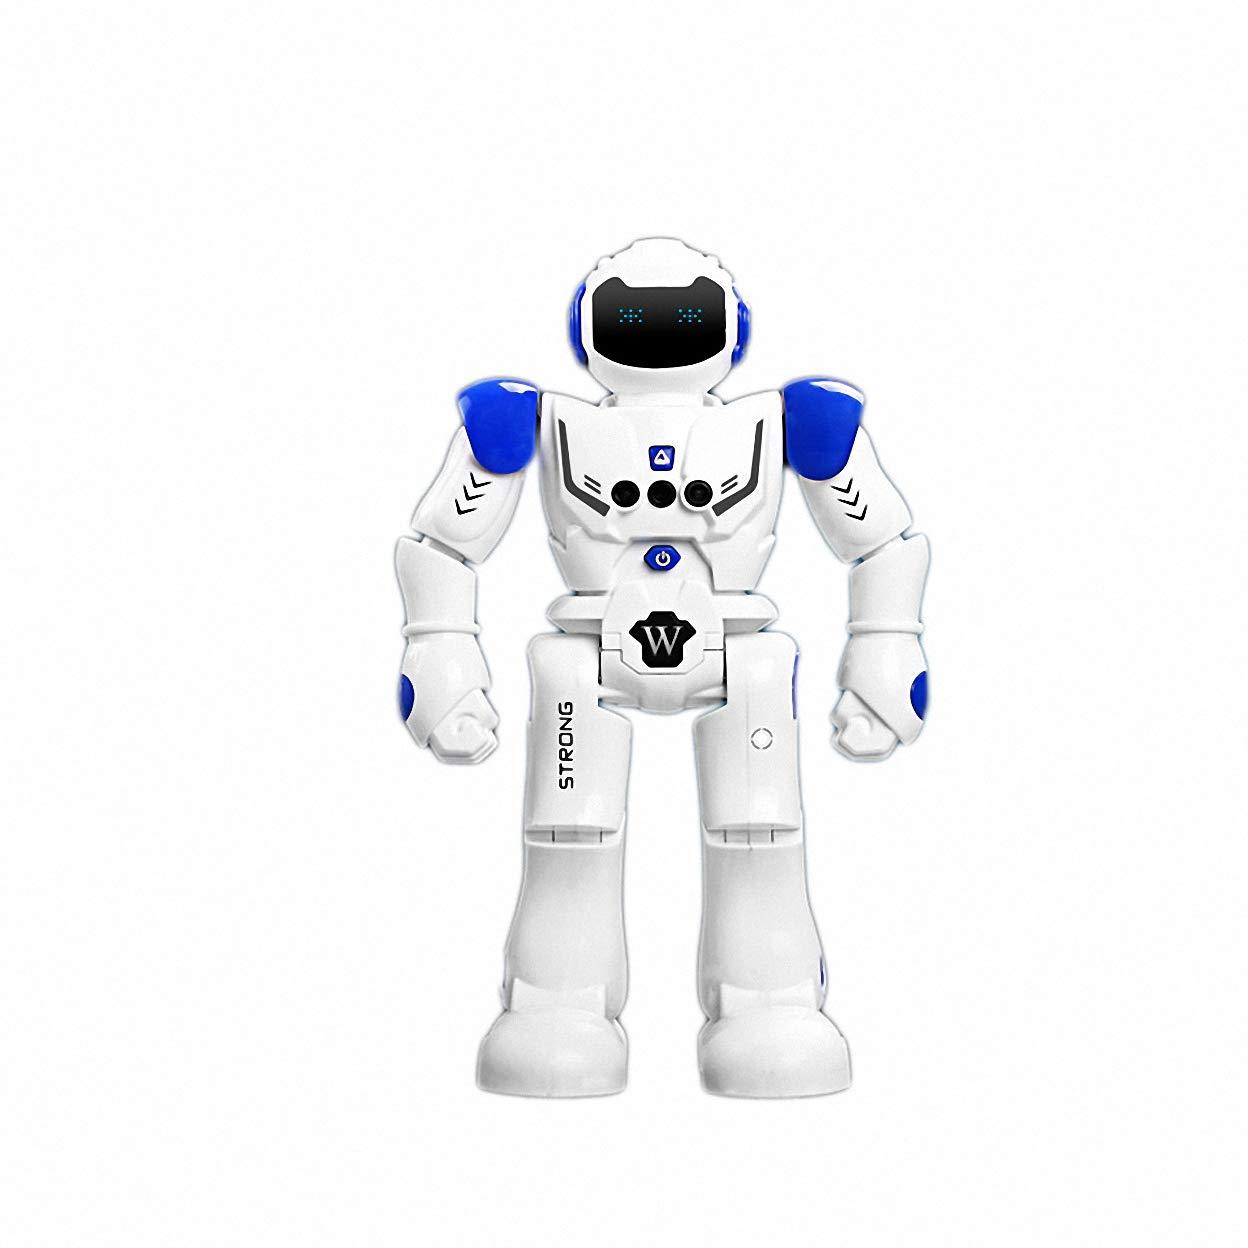 Robots for Kids-Robot Toy Hand Gesture Sensing Sing Dancing Walking Programming Robotics Toy for Teens Boys Kids Age 3 4 5 6 7 8 Year Kids Toys